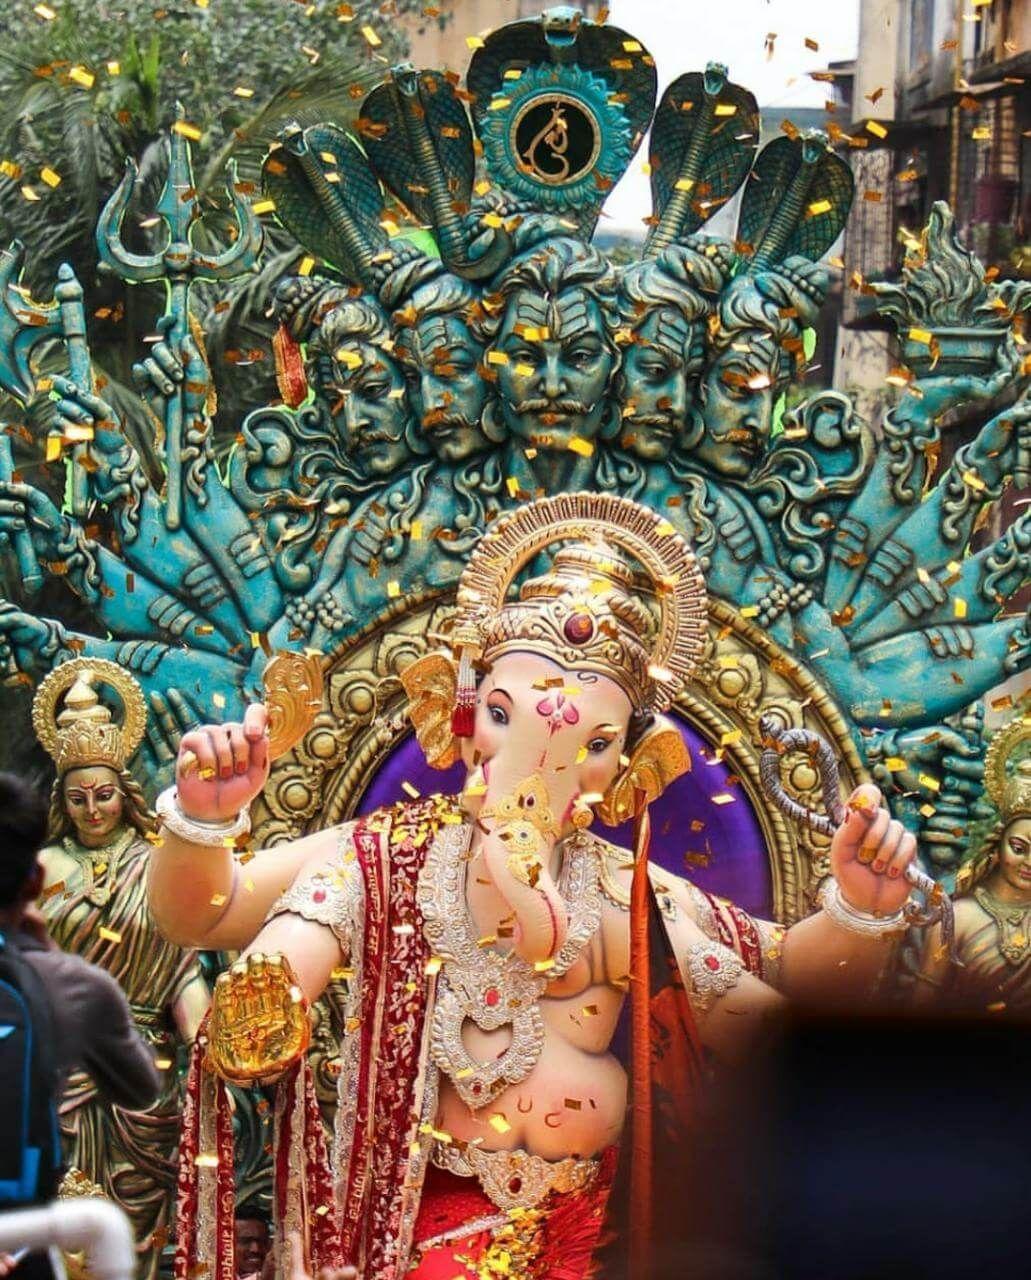 1031x1280 चिंतामणी गणपती फोटो २०१ ९ ảnh chintamani ganpati 2019, ảnh chintamani 2019, chinchpokli cha chintaman.  Hình nền Ganesh, Hình nền Hanuman HD, Hình ảnh Ganesha